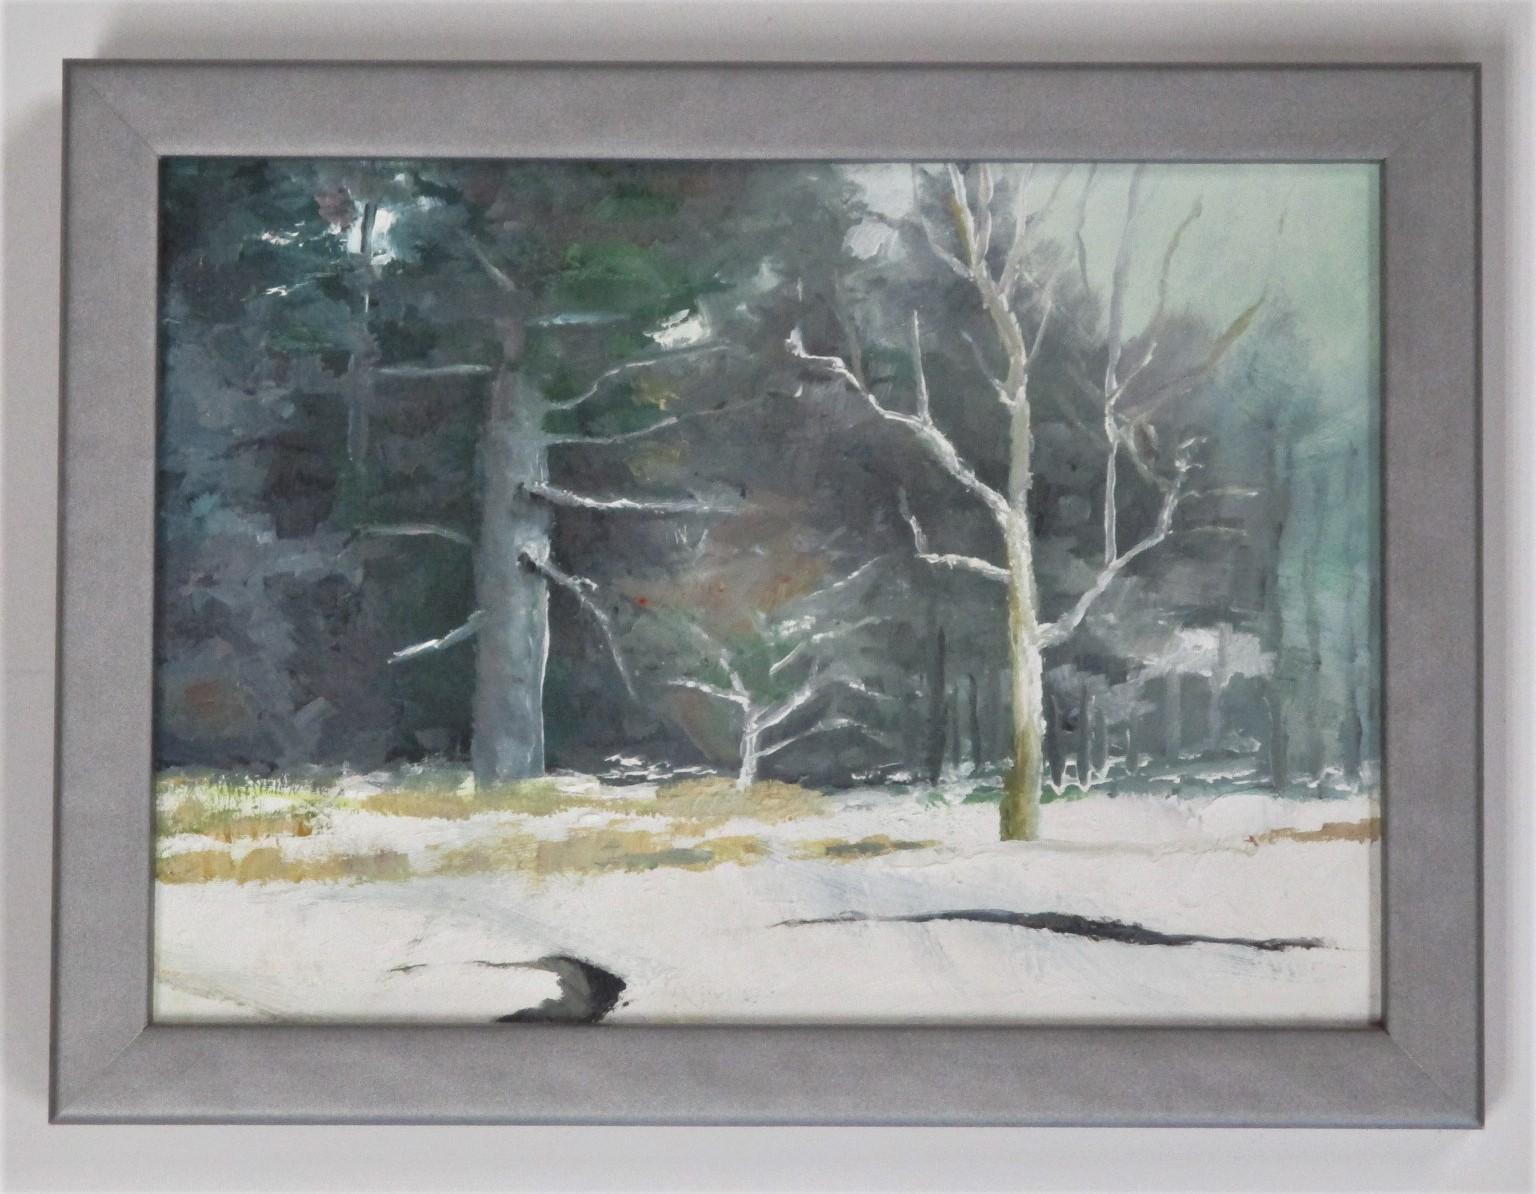 Stuck in the snow by  Robert Moore - Masterpiece Online